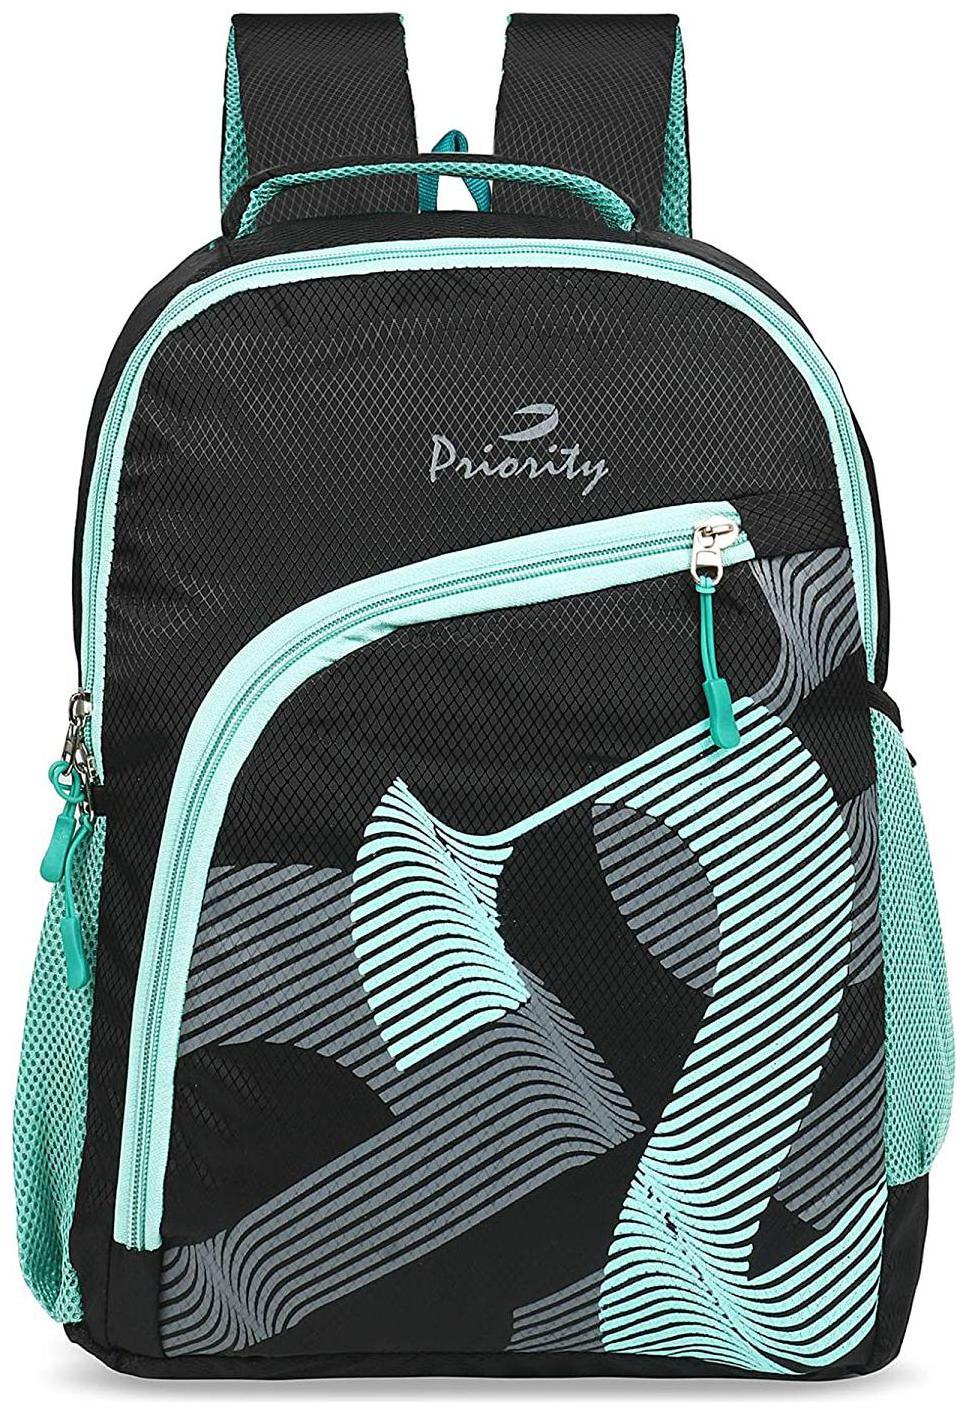 Priority Cherry 0010 Black Backpack by Buy More